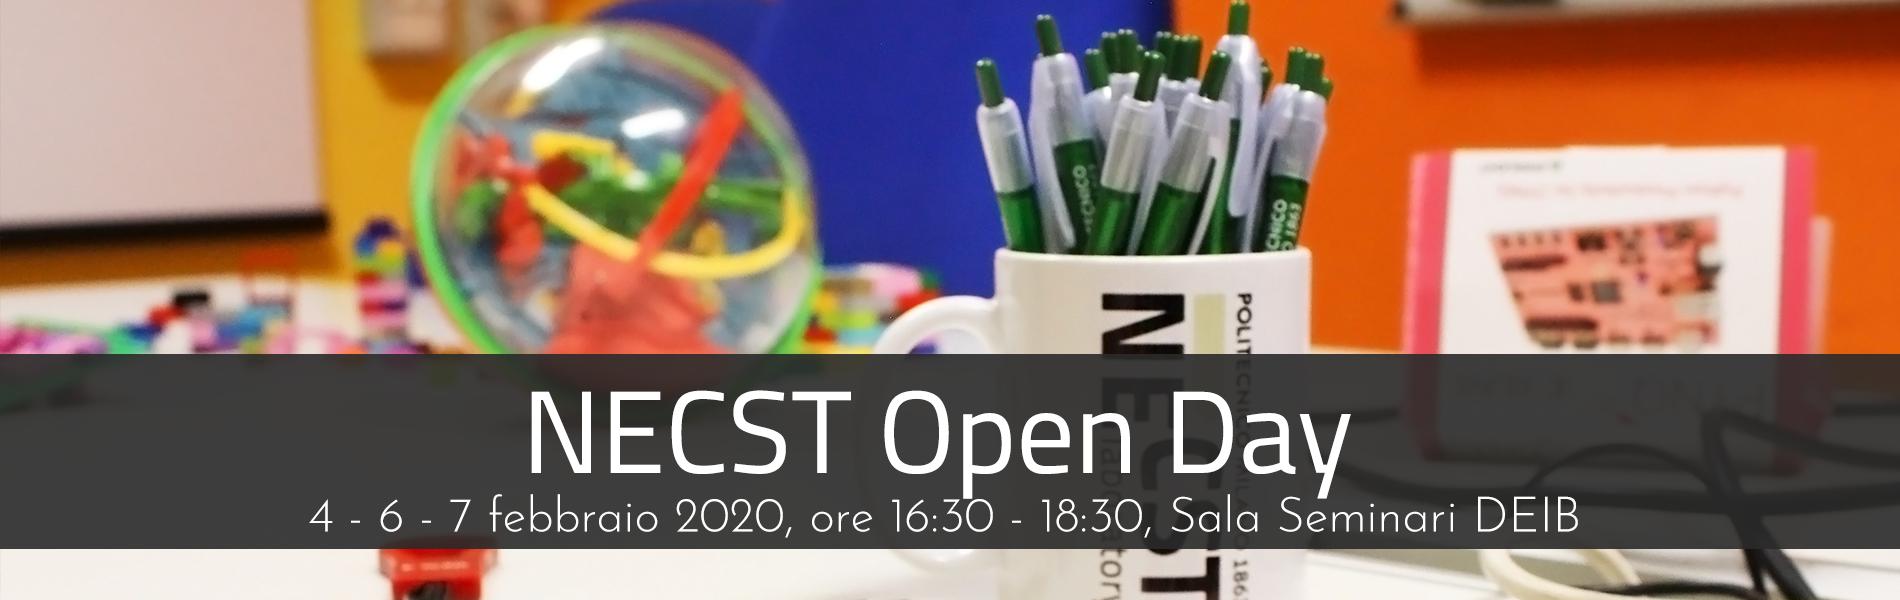 NECST Open Day